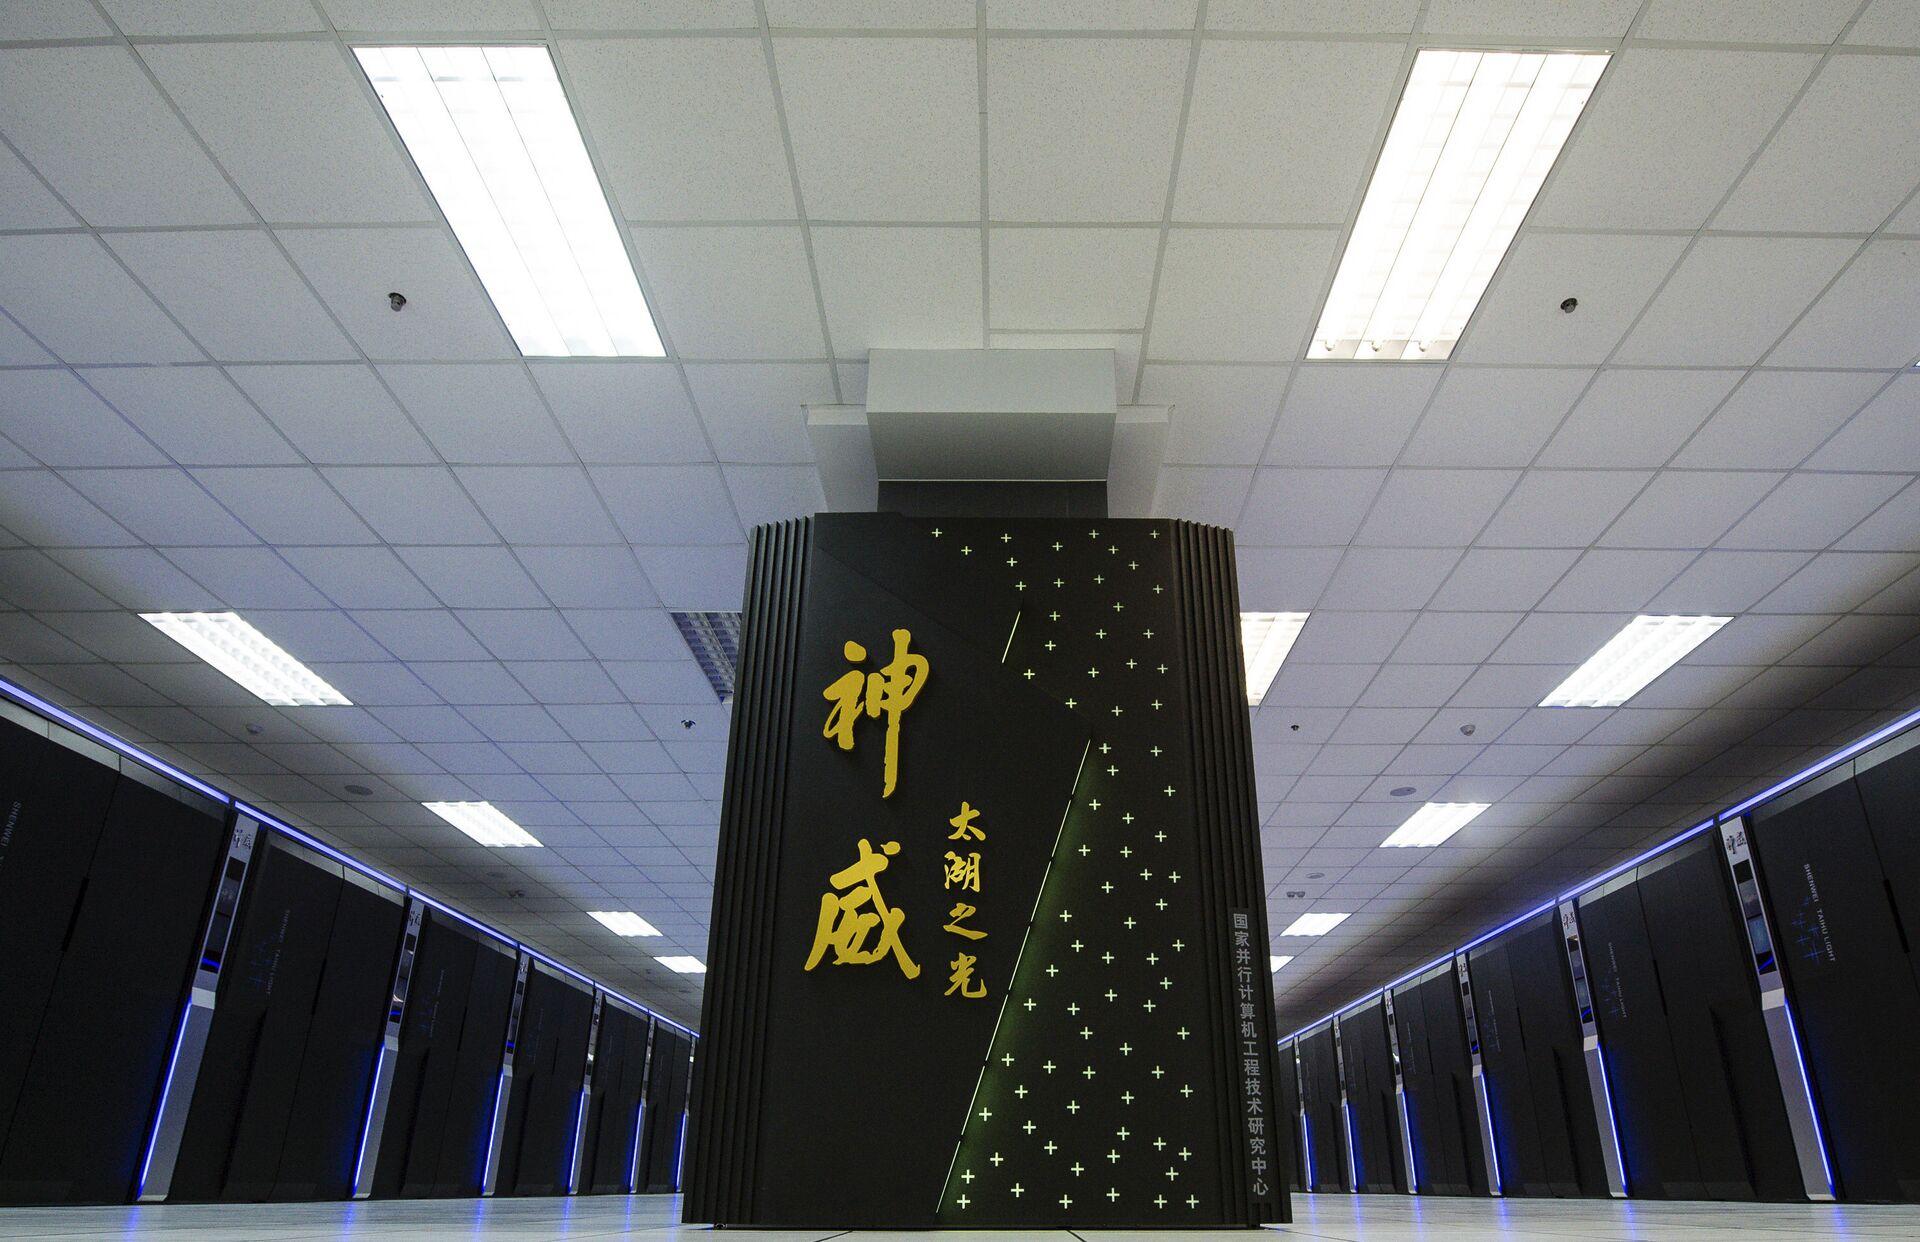 Beijing Vows to Retaliate in Response to US Blacklisting Chinese Supercomputing Companies - Sputnik International, 1920, 09.04.2021